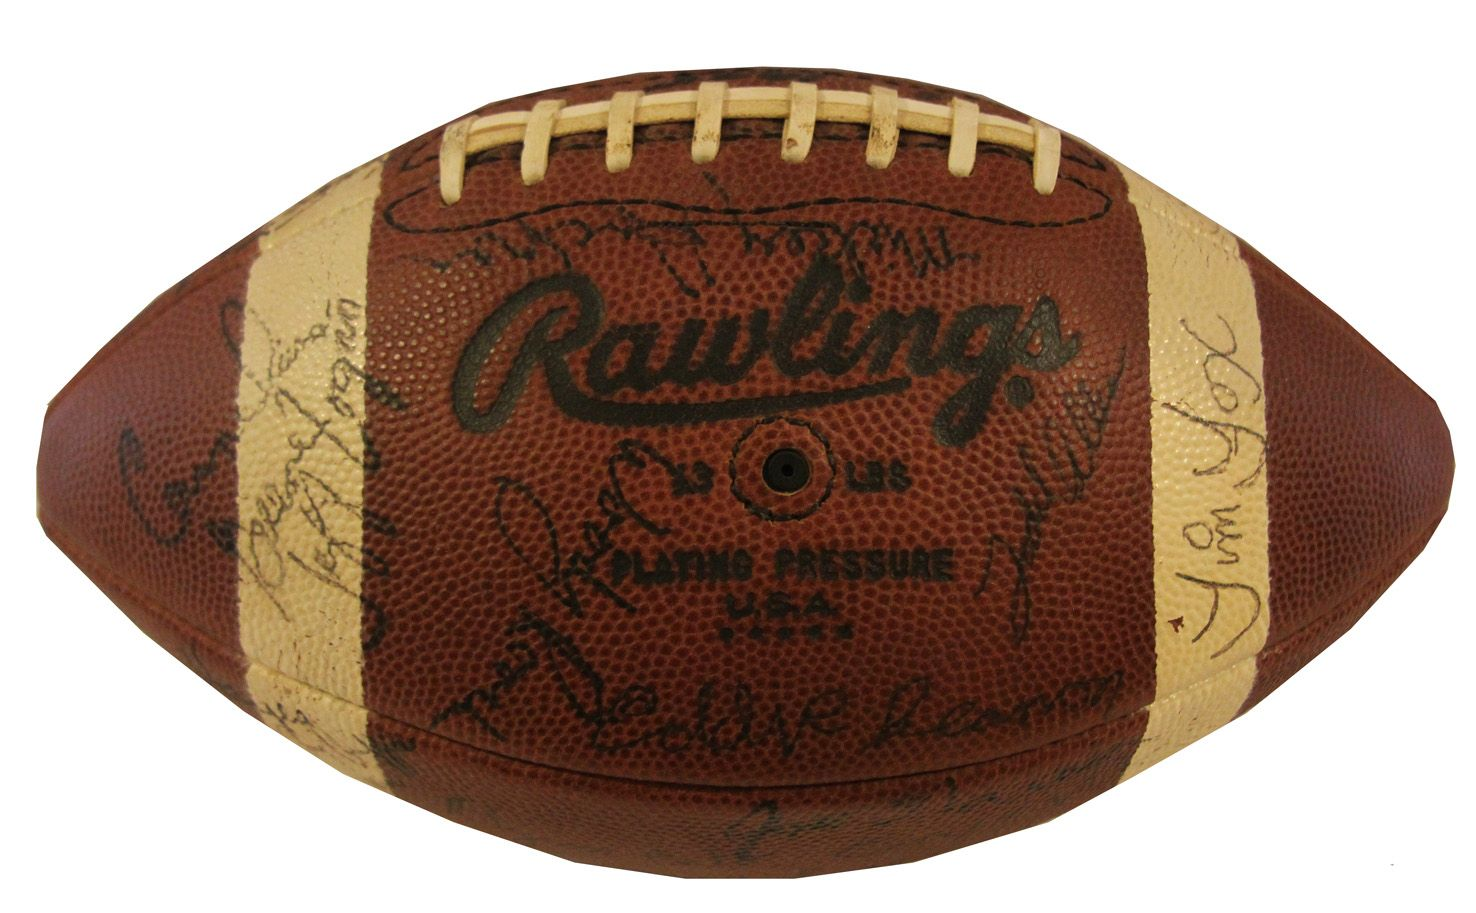 Autographed Football | eBay